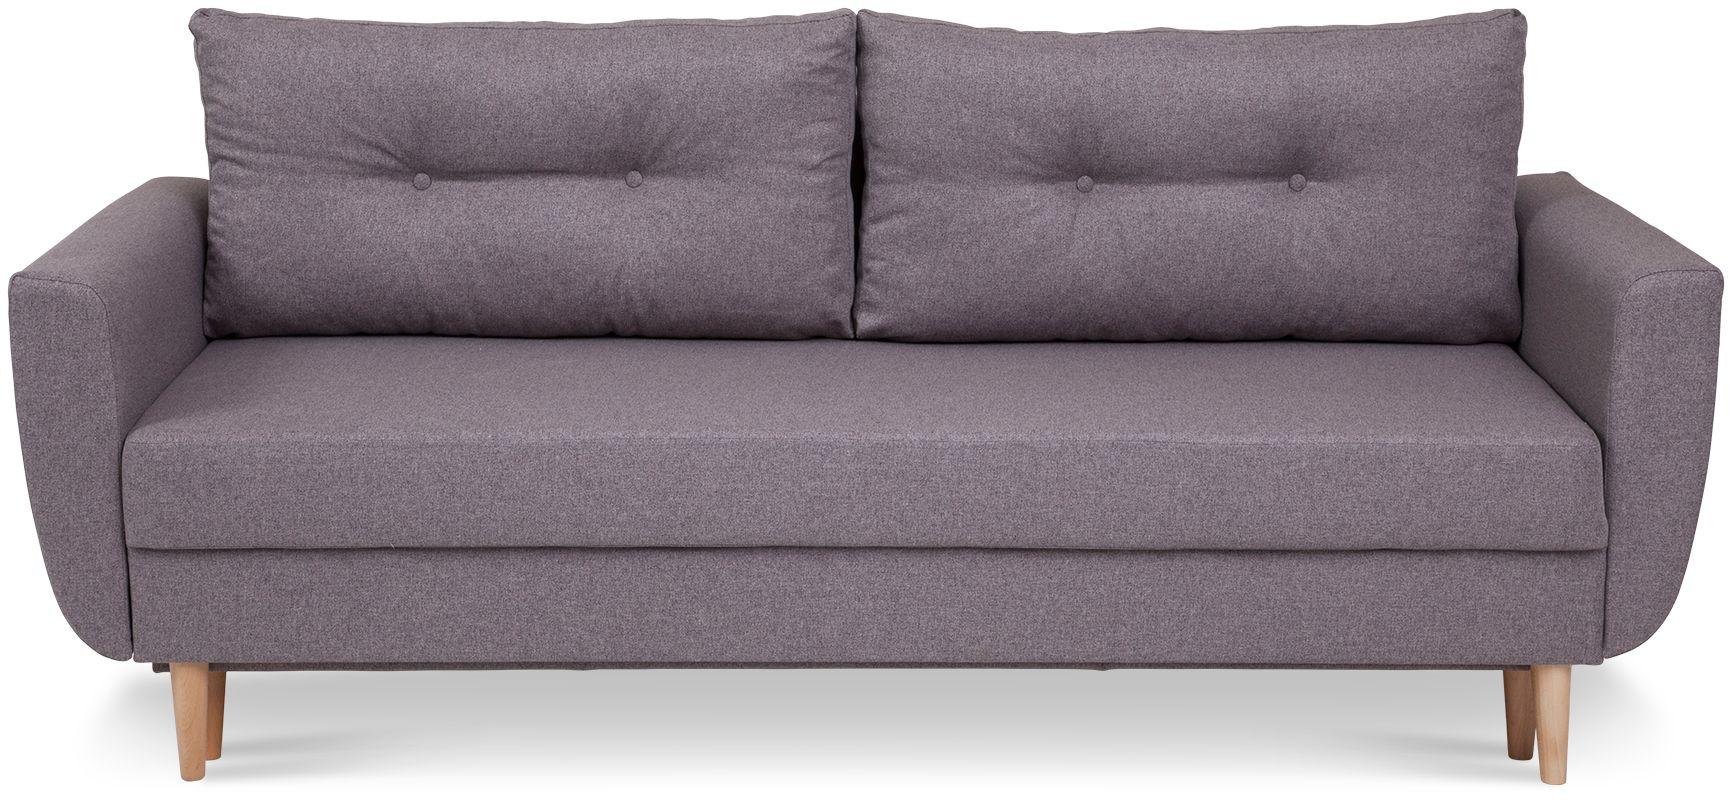 sofa diora 2